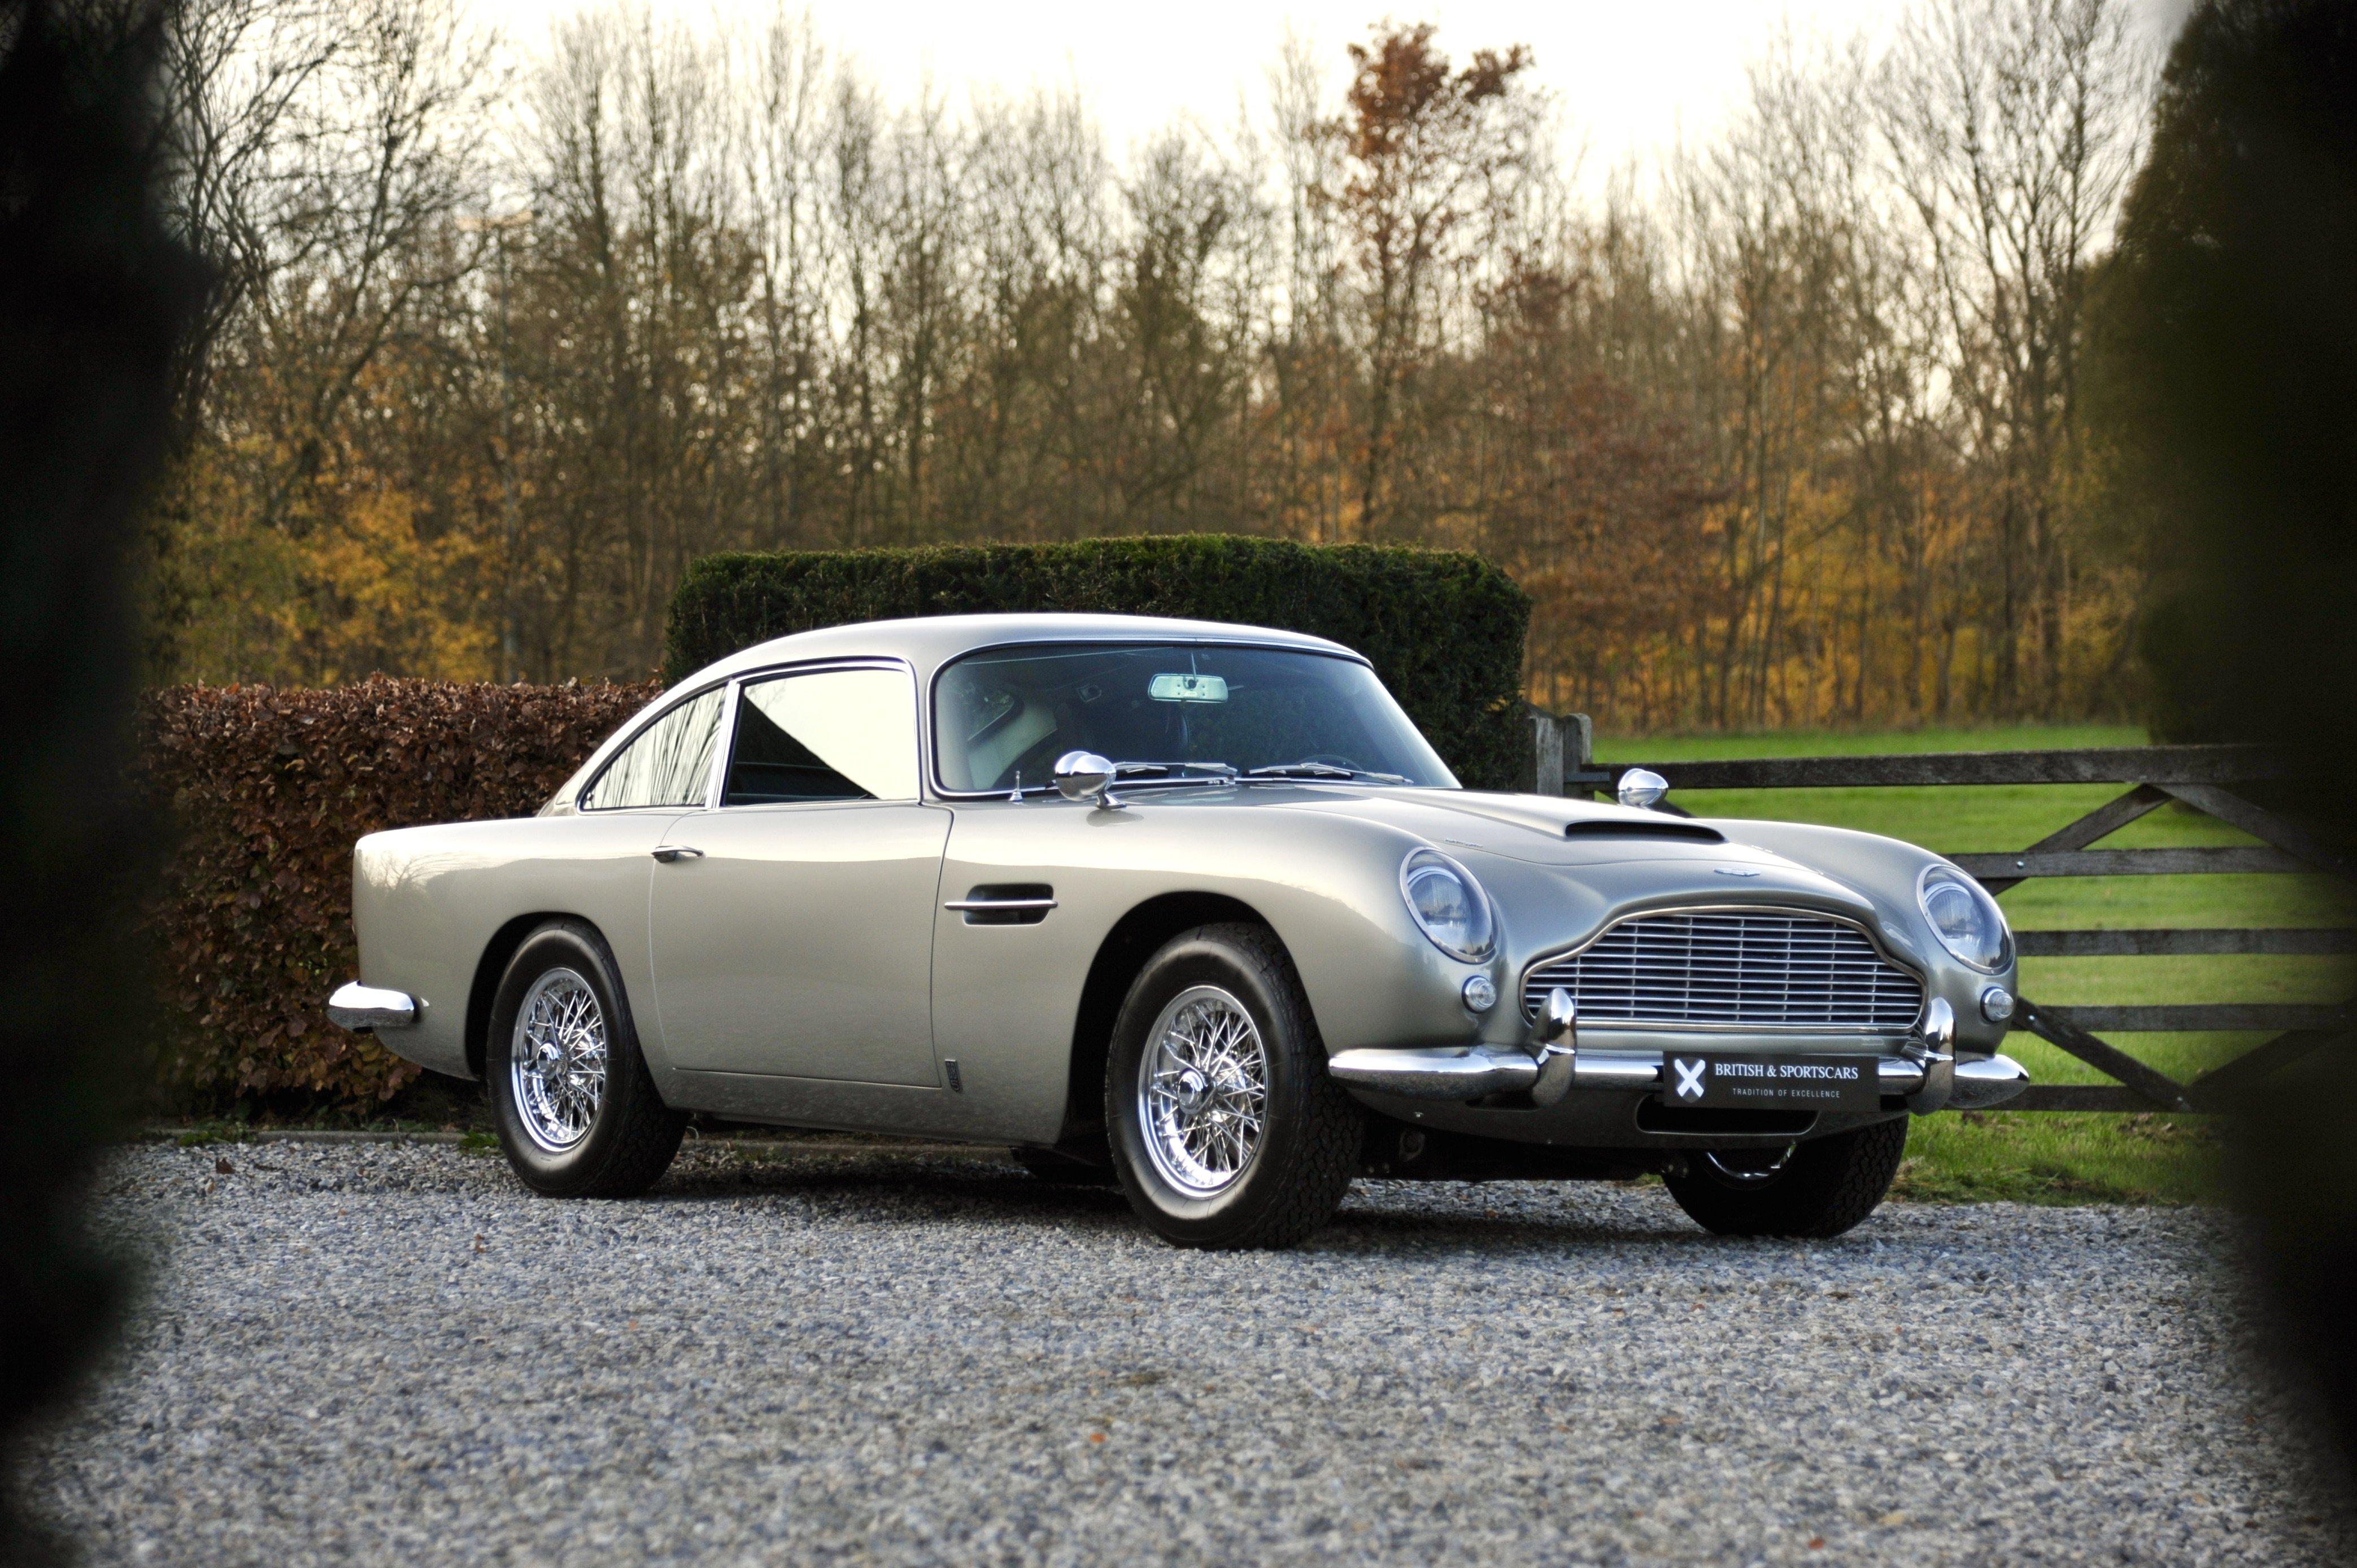 1964 Aston Martin Db5 Original Lhd Vintage Car For Sale